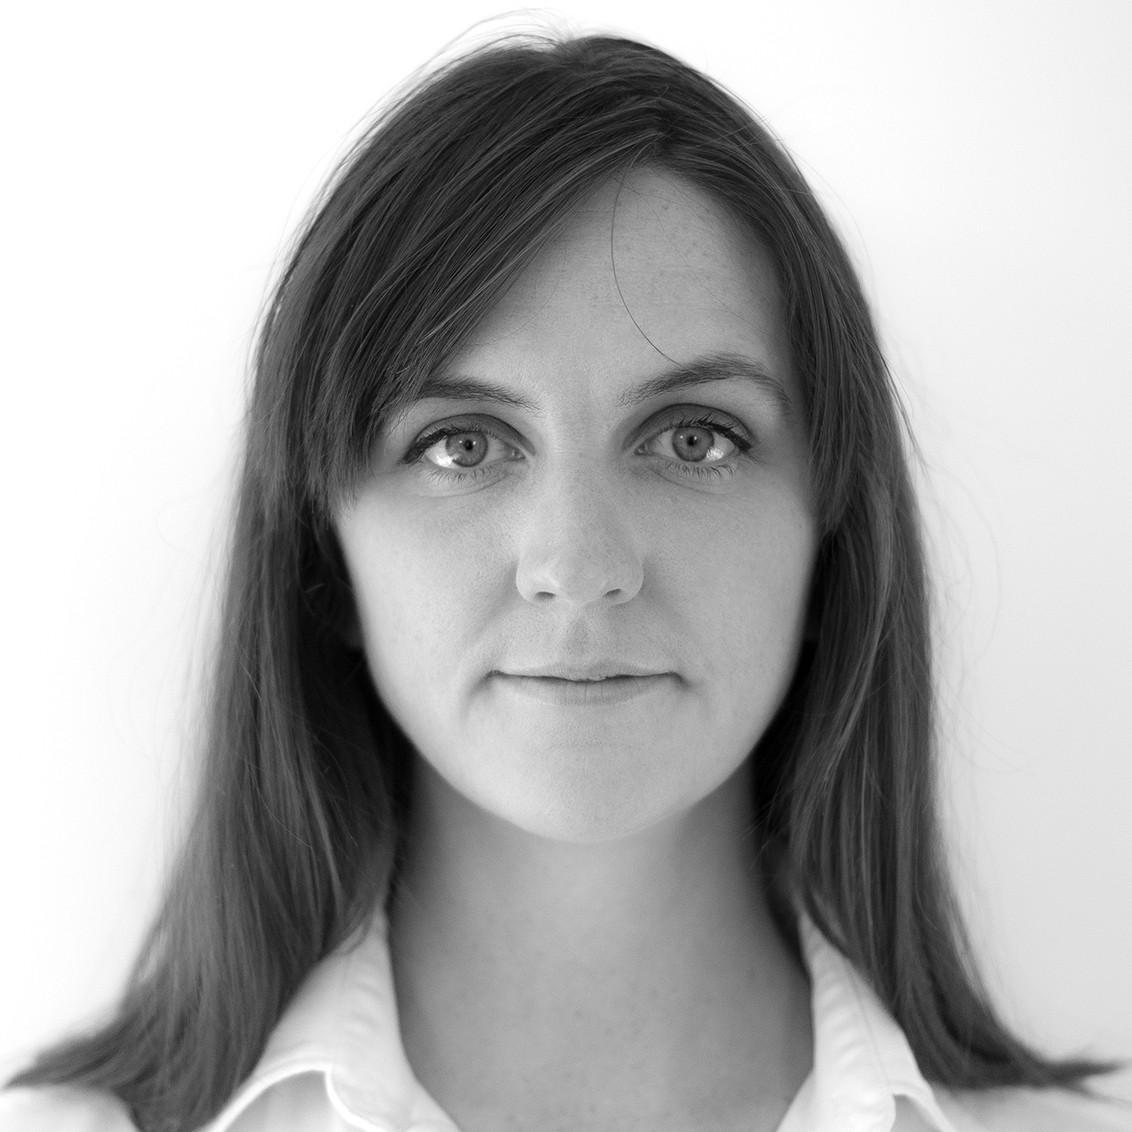 Black and white portrait of Zannah Matson